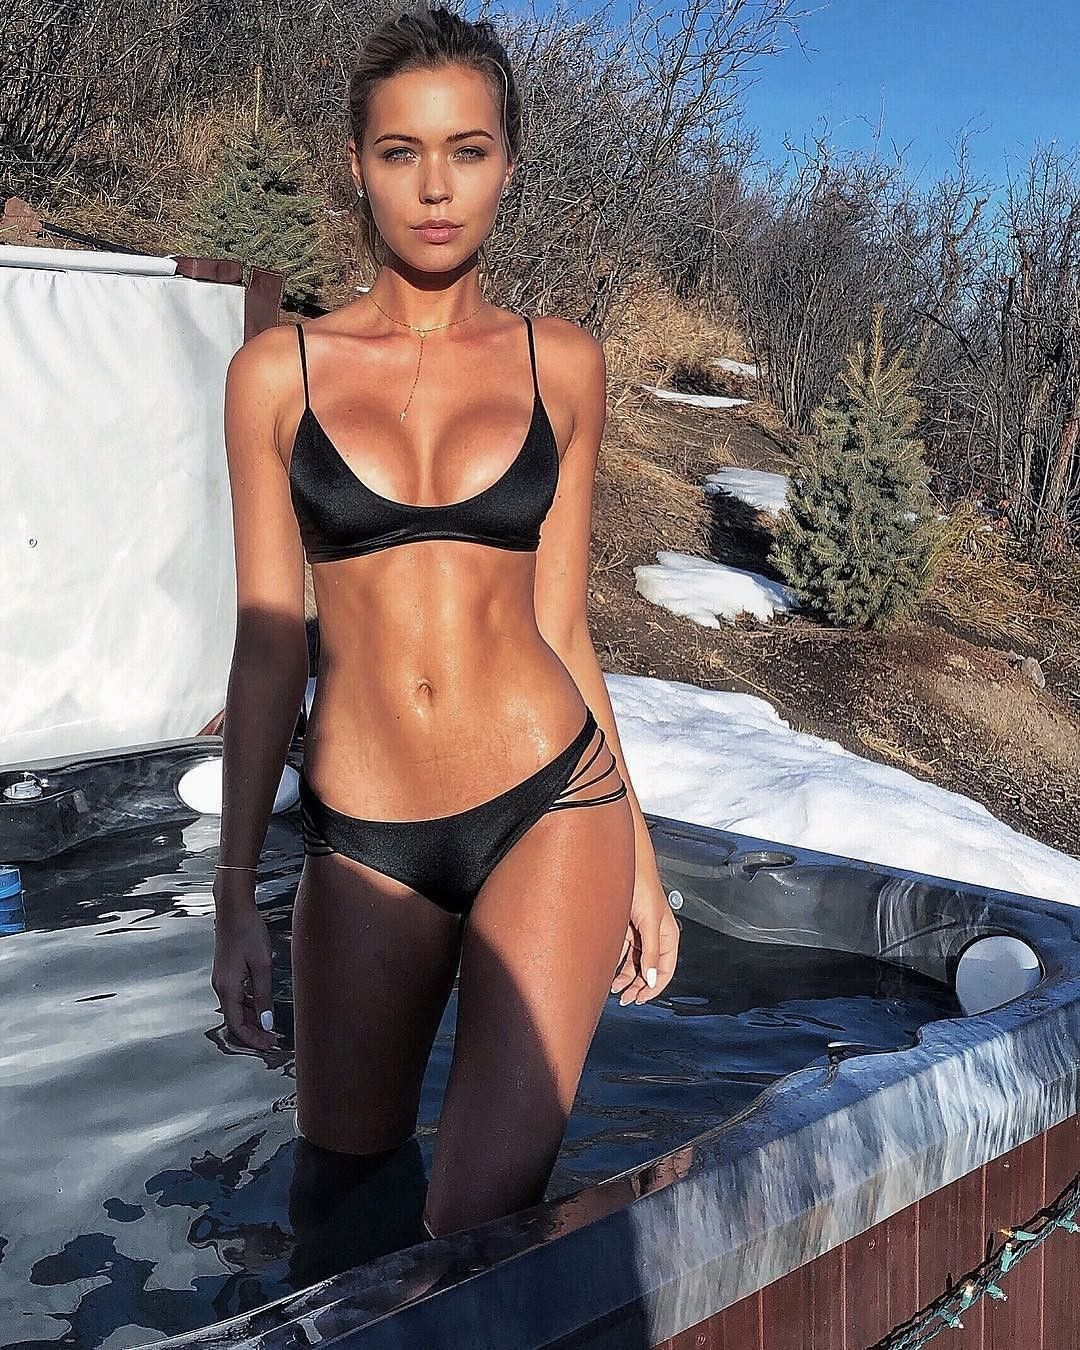 Sandra Kubicka Outfits Lucy Chicas En Bikini Mujeres Guapas Y